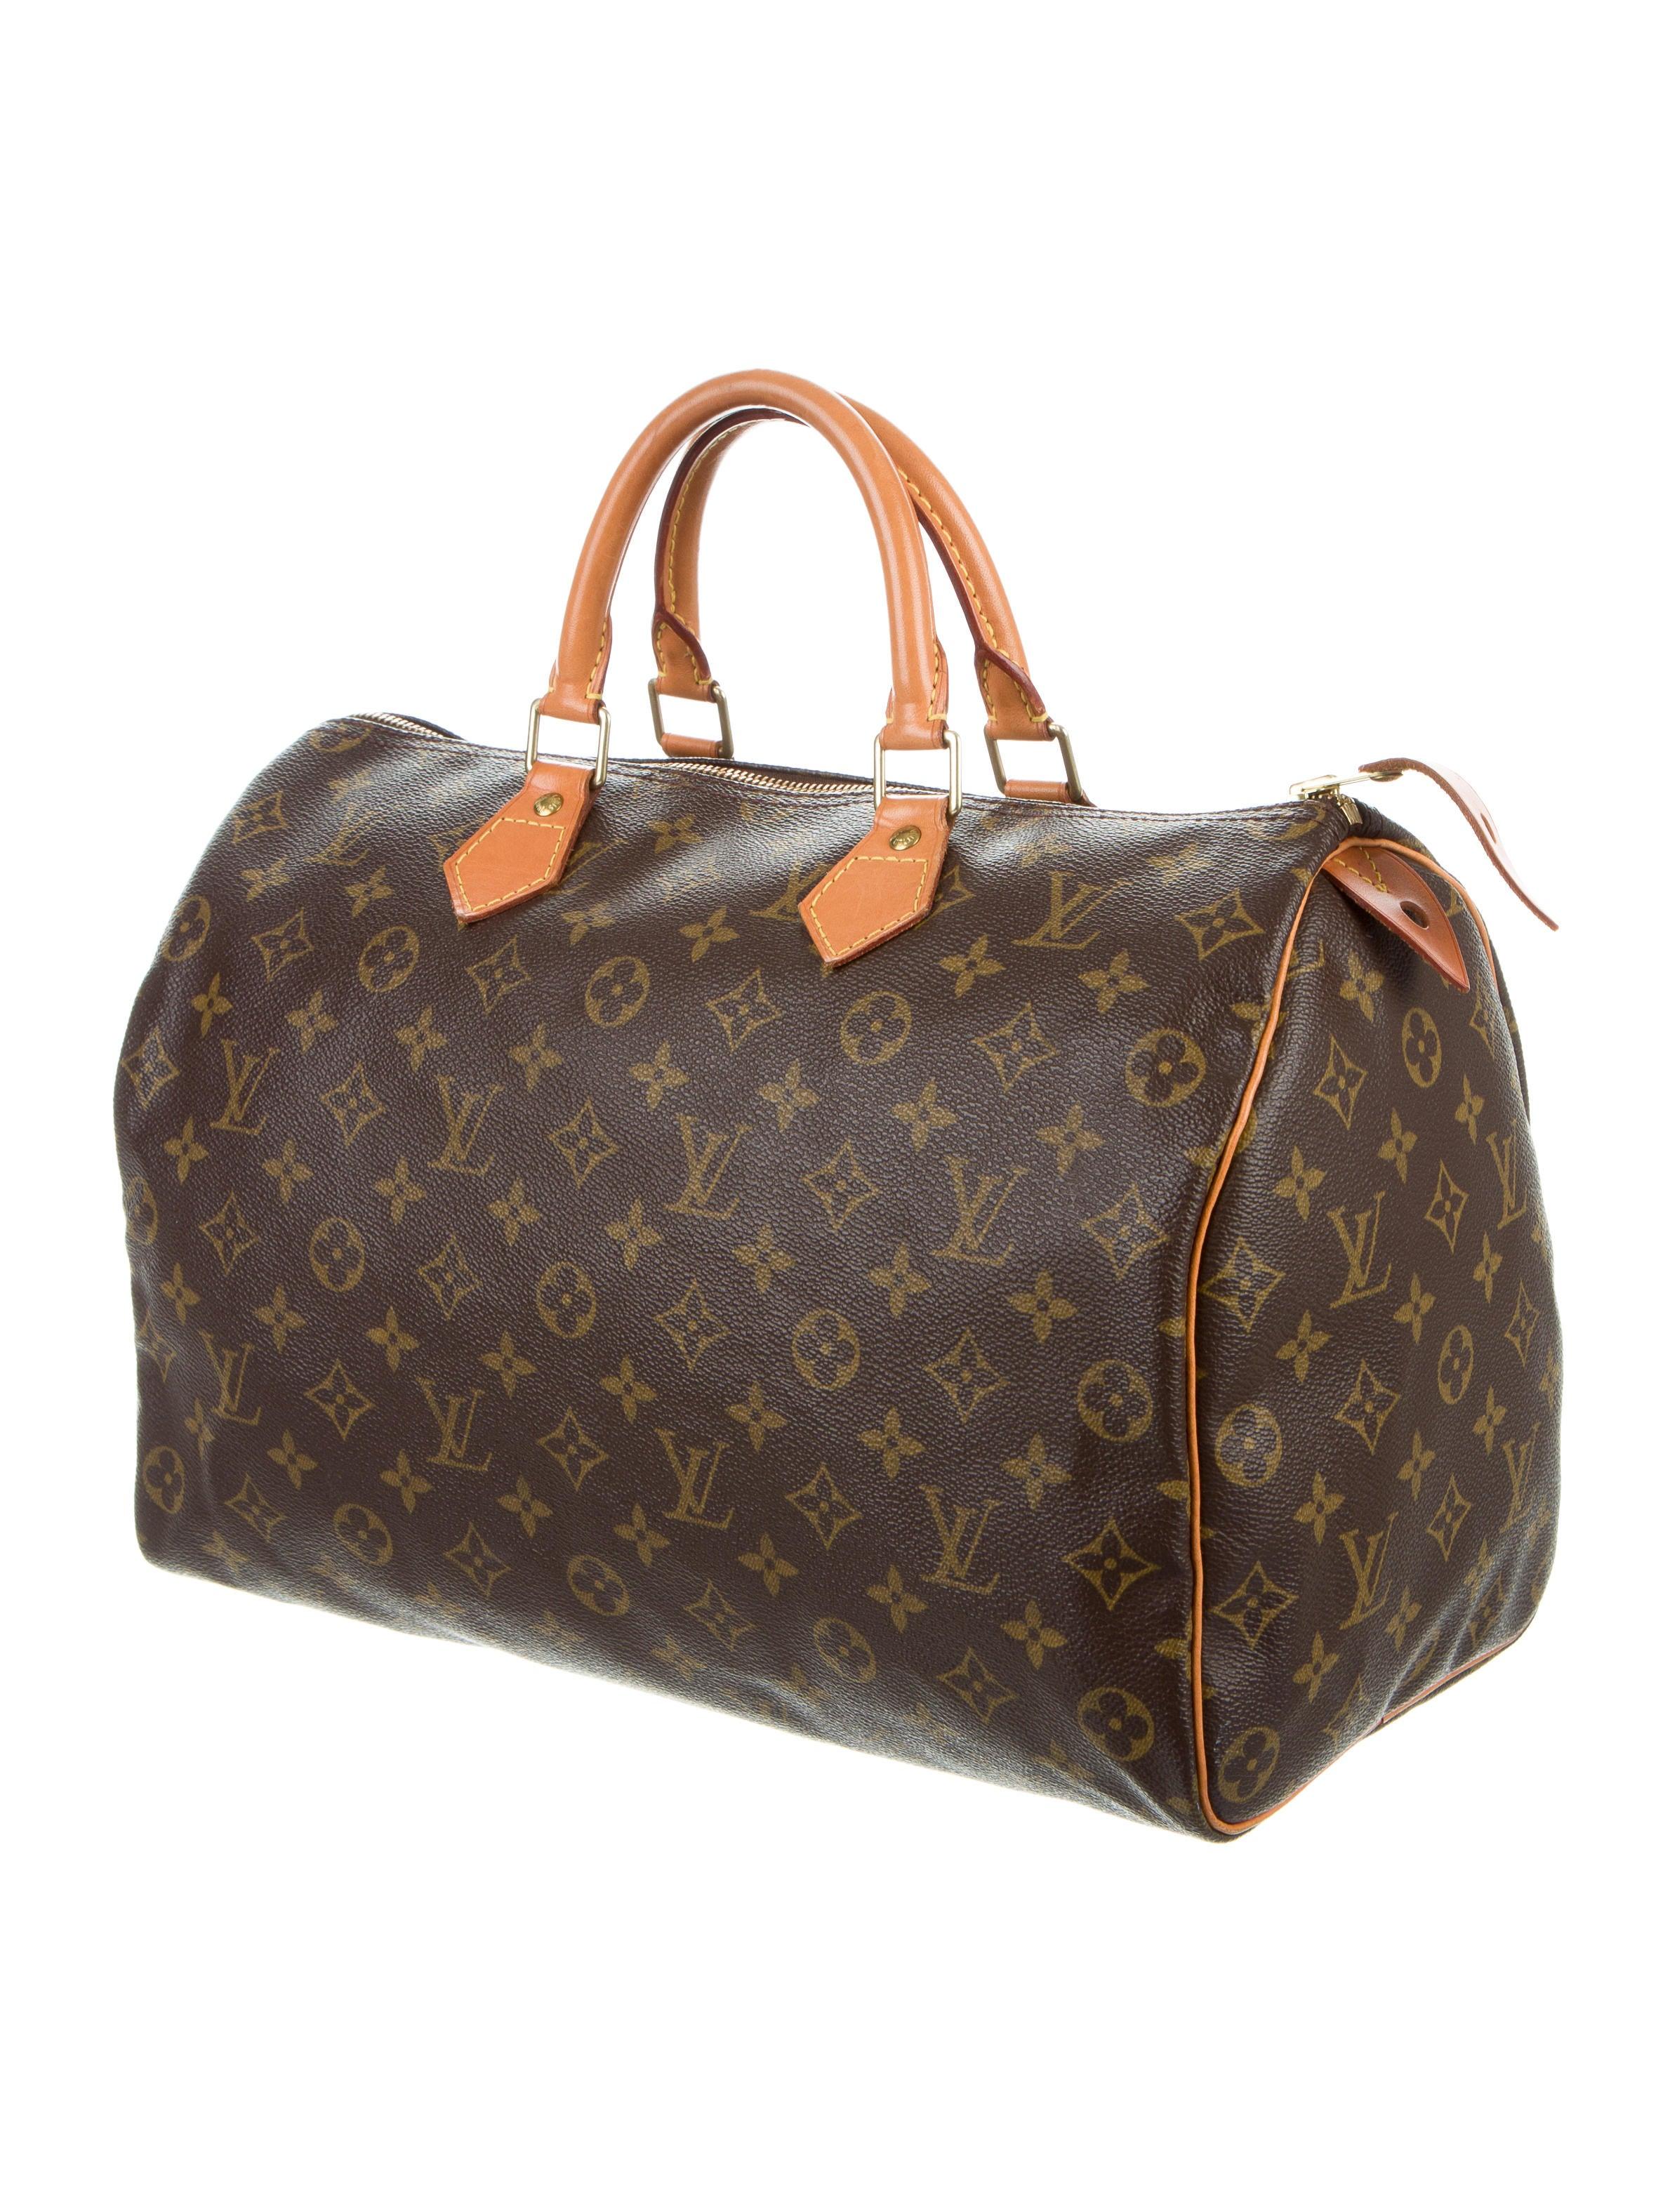 louis vuitton monogram speedy 35 handbags lou118038. Black Bedroom Furniture Sets. Home Design Ideas